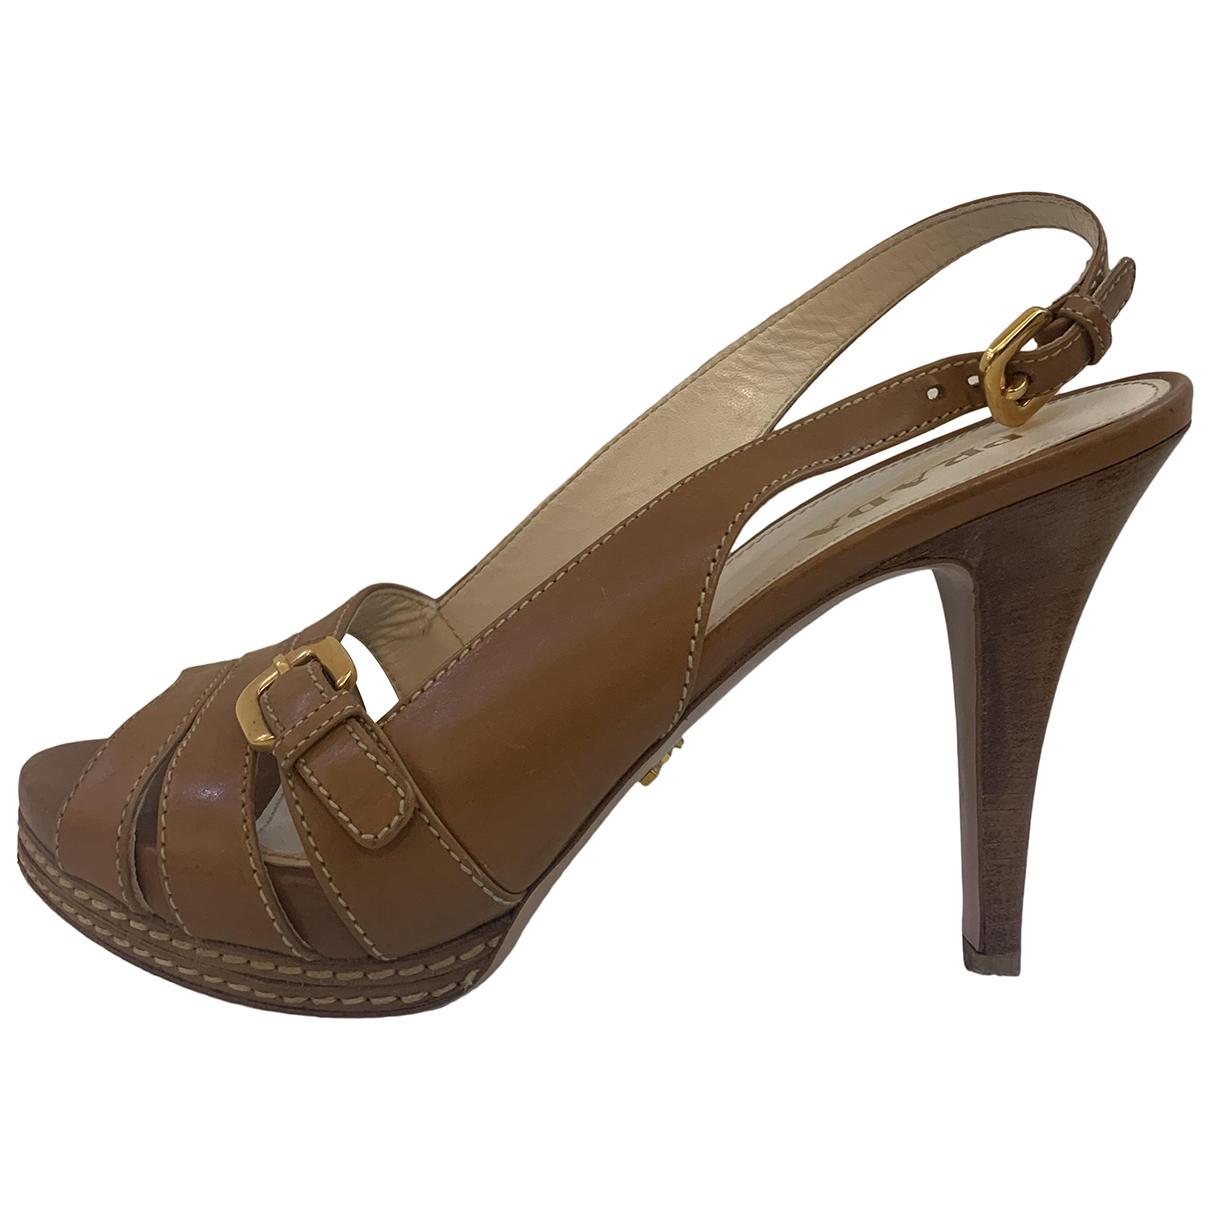 Prada N Camel Leather Heels for Women 38.5 EU